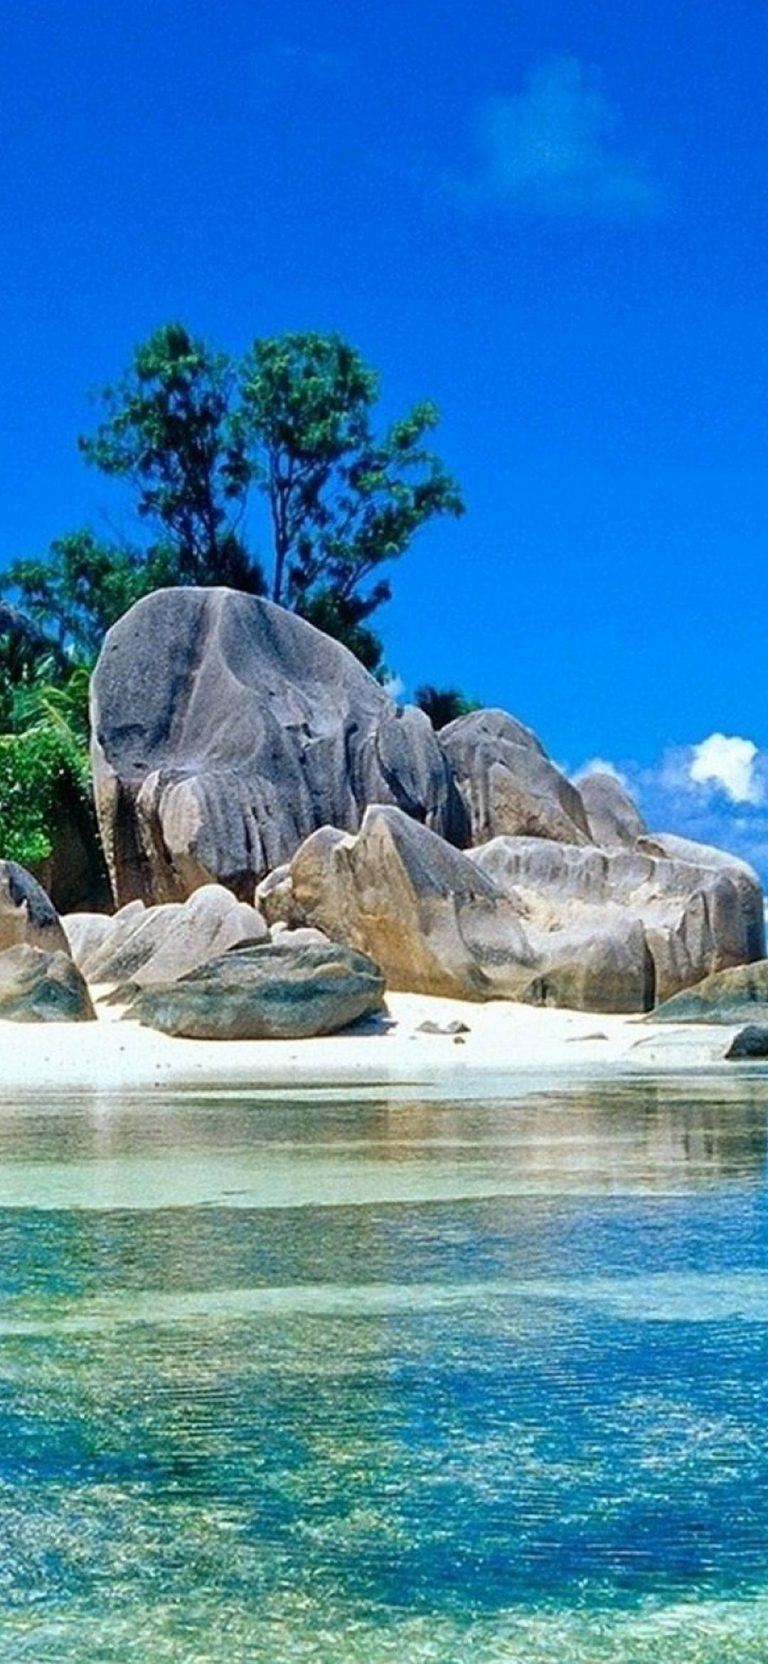 Stones Tropical Ocean 1080x2340 768x1664